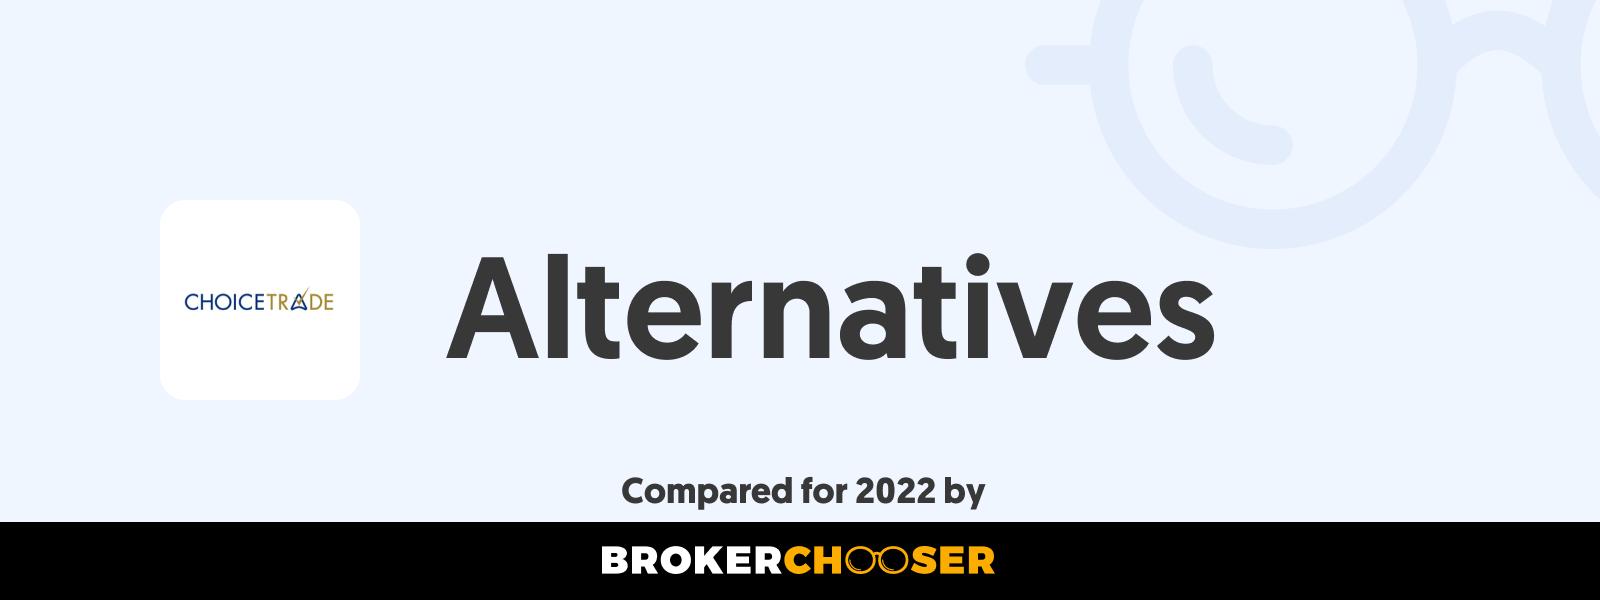 ChoiceTrade Alternatives